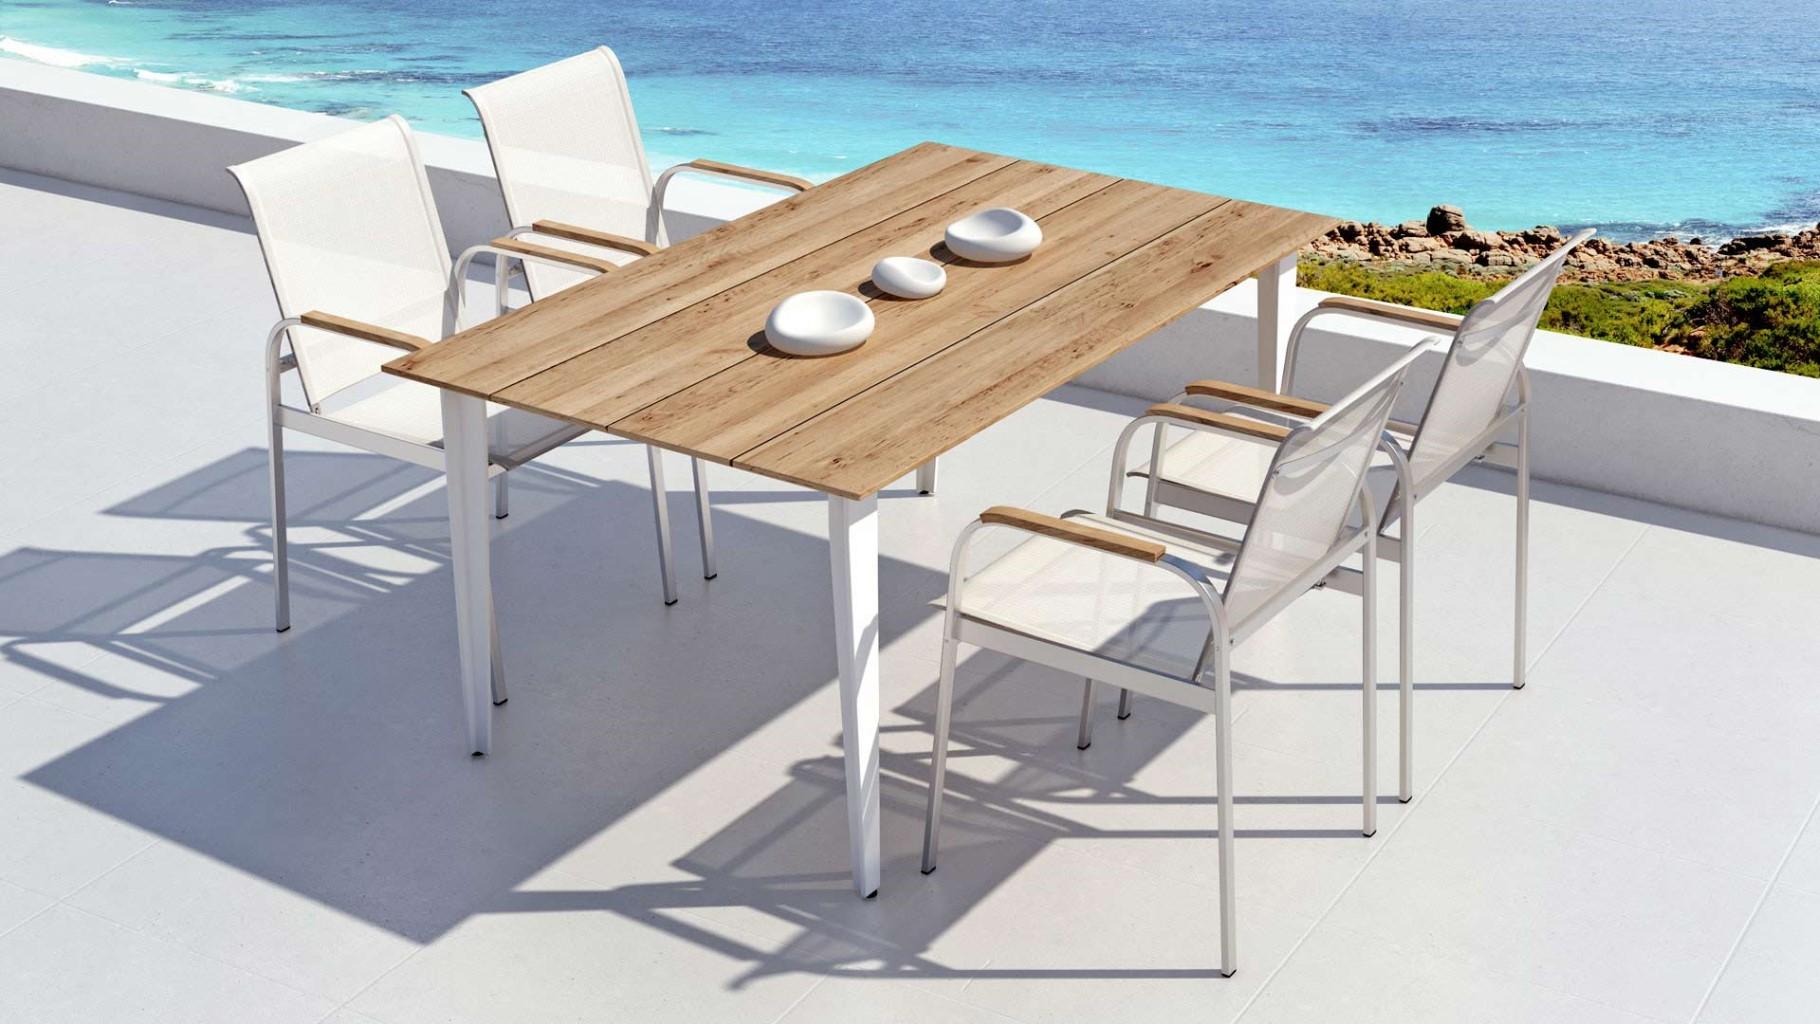 impulse-dining-chair-germany